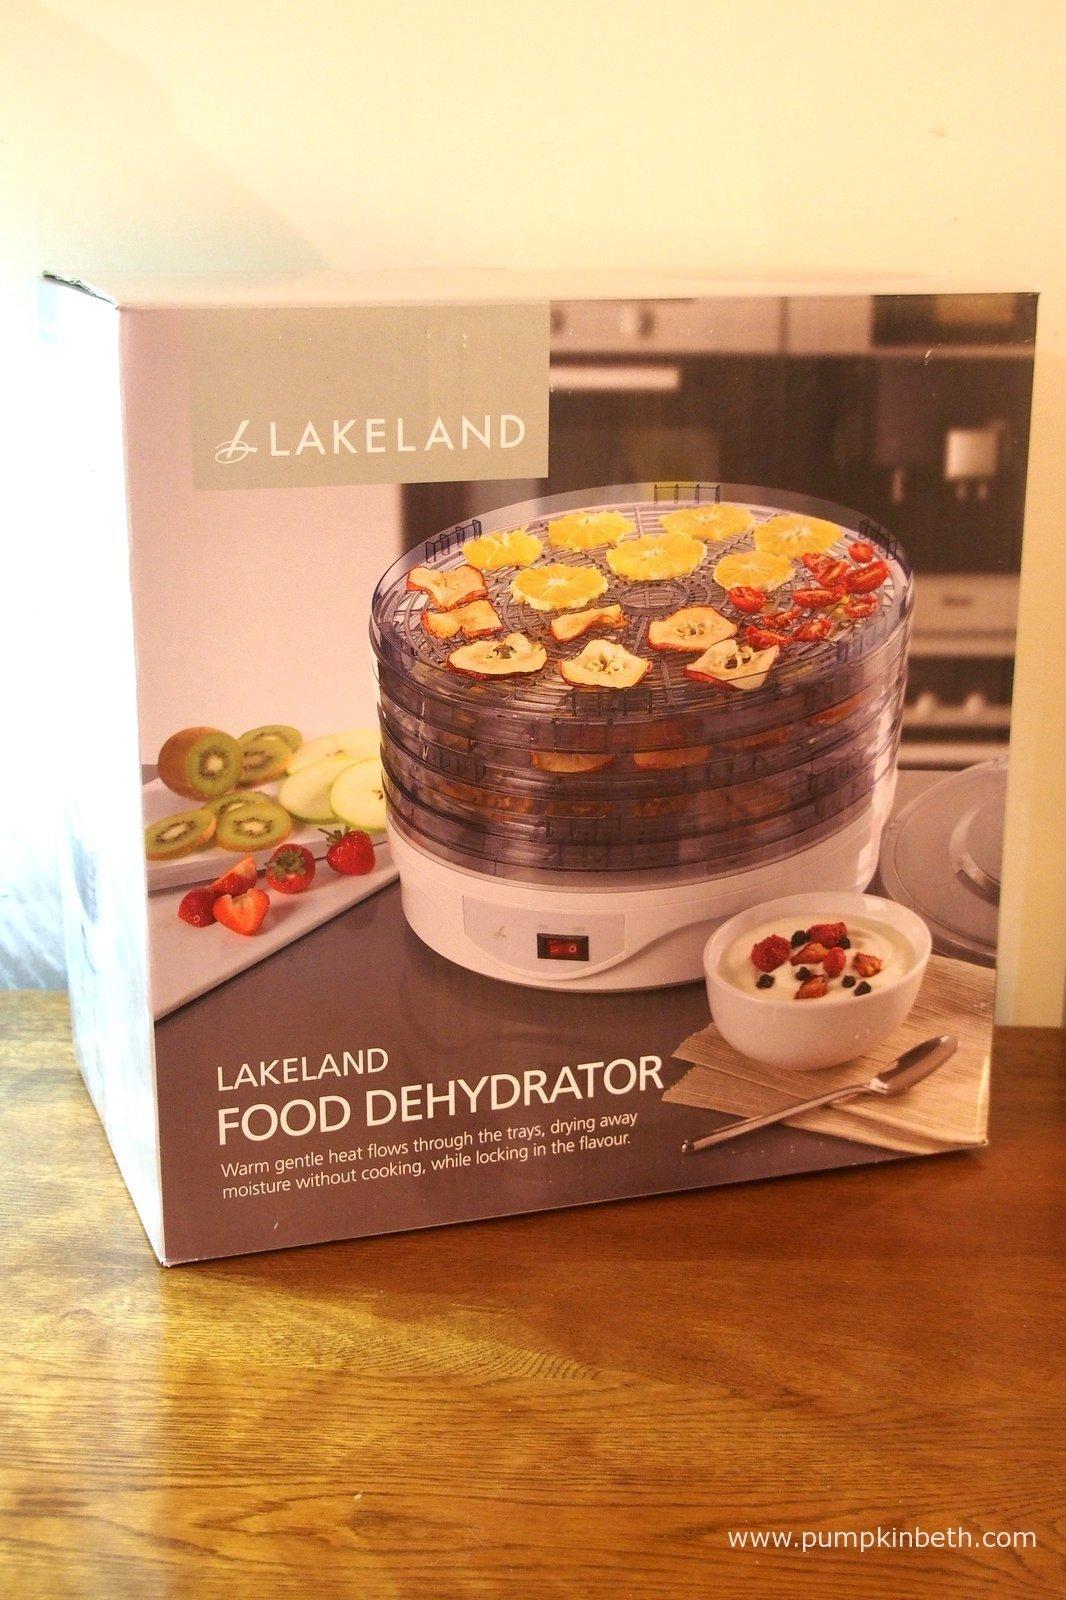 Lakeland My Kitchen Food Dehydrator Review - Pumpkin Beth